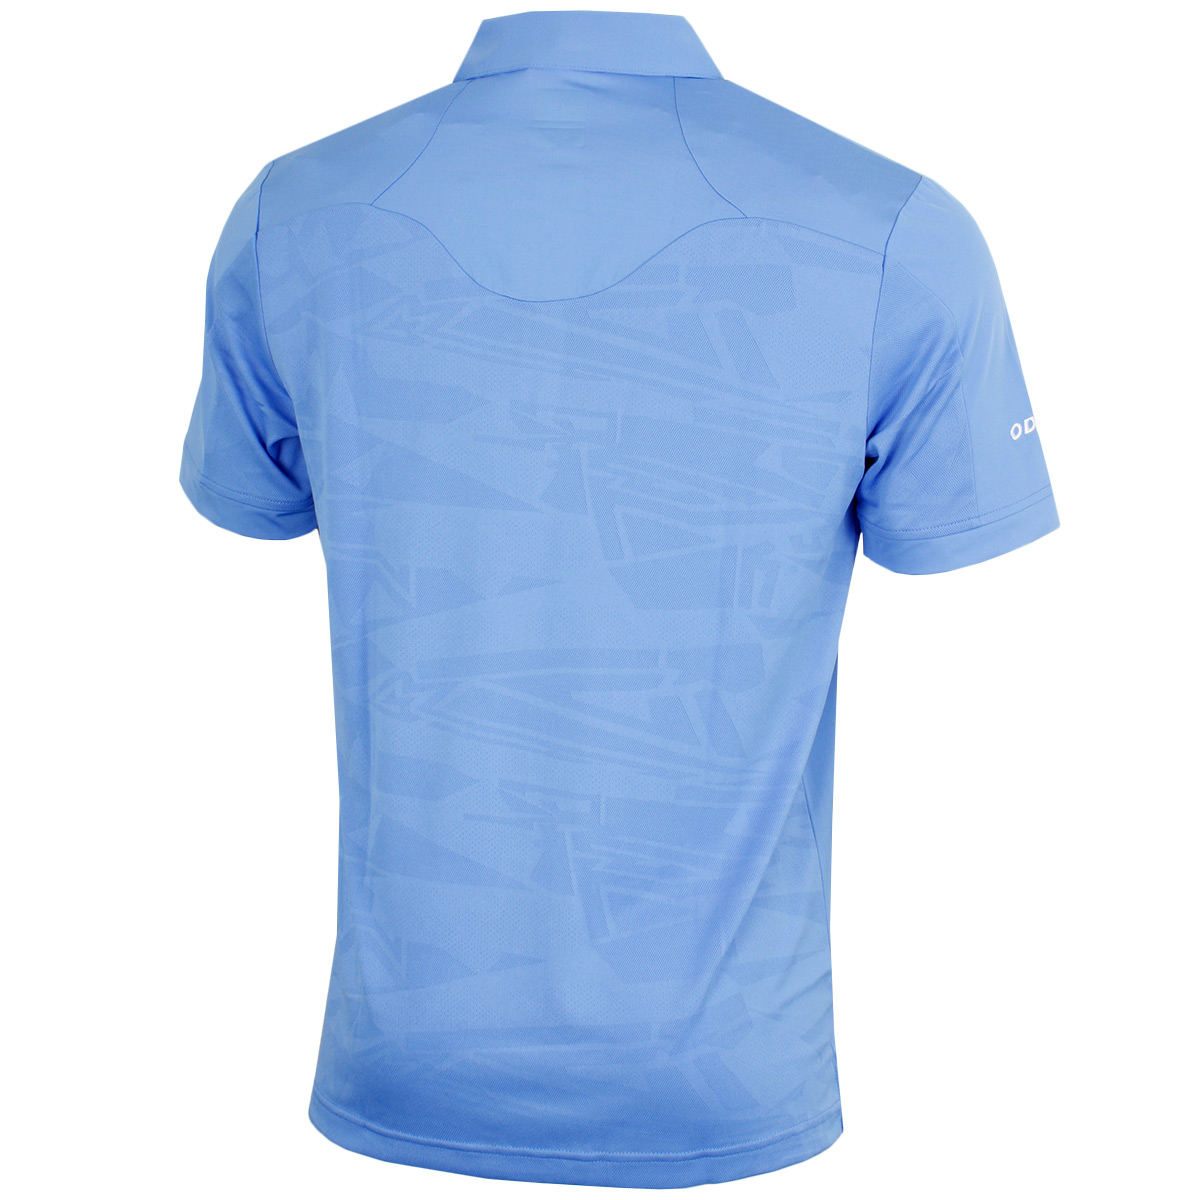 76fe324c Callaway Golf Mens Opti-Vent Tour Polo II Shirt 50% OFF RRP   eBay